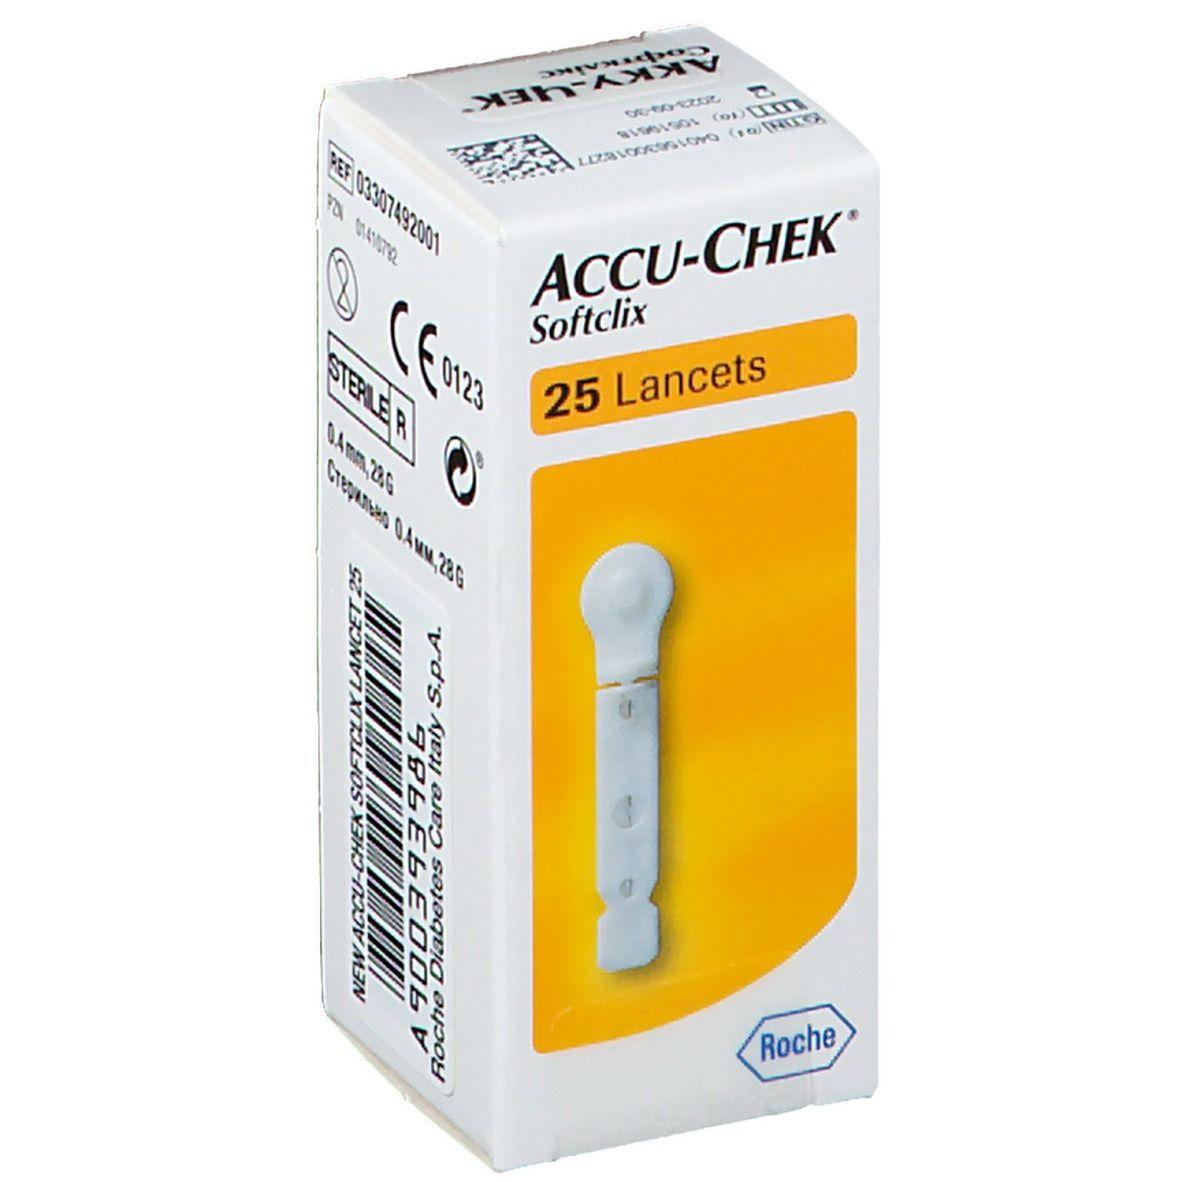 Accu-Chek Roche Softclix 25 pz Lancette